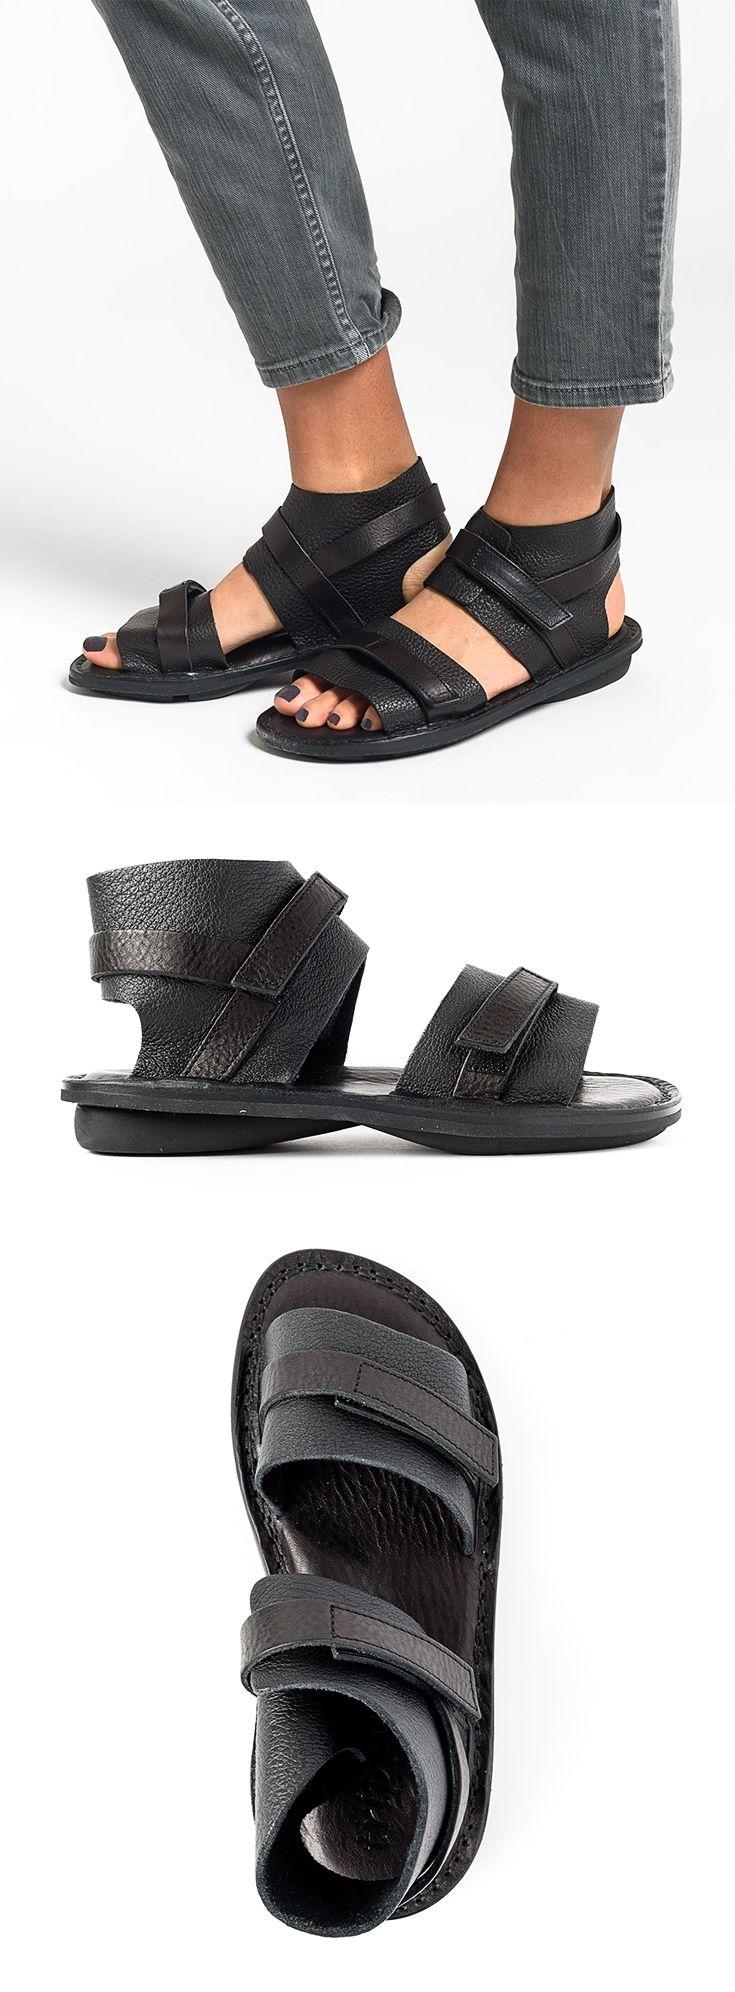 Trippen Rom Sandal in Black | Santa Fe Dry Goods & Workshop #trippen #trippenshoes #uniqueshoes #shoes #sandals #leather #footwear #fashion #design #style #trippenusa #spring #summer #santafe #santafedrygoods